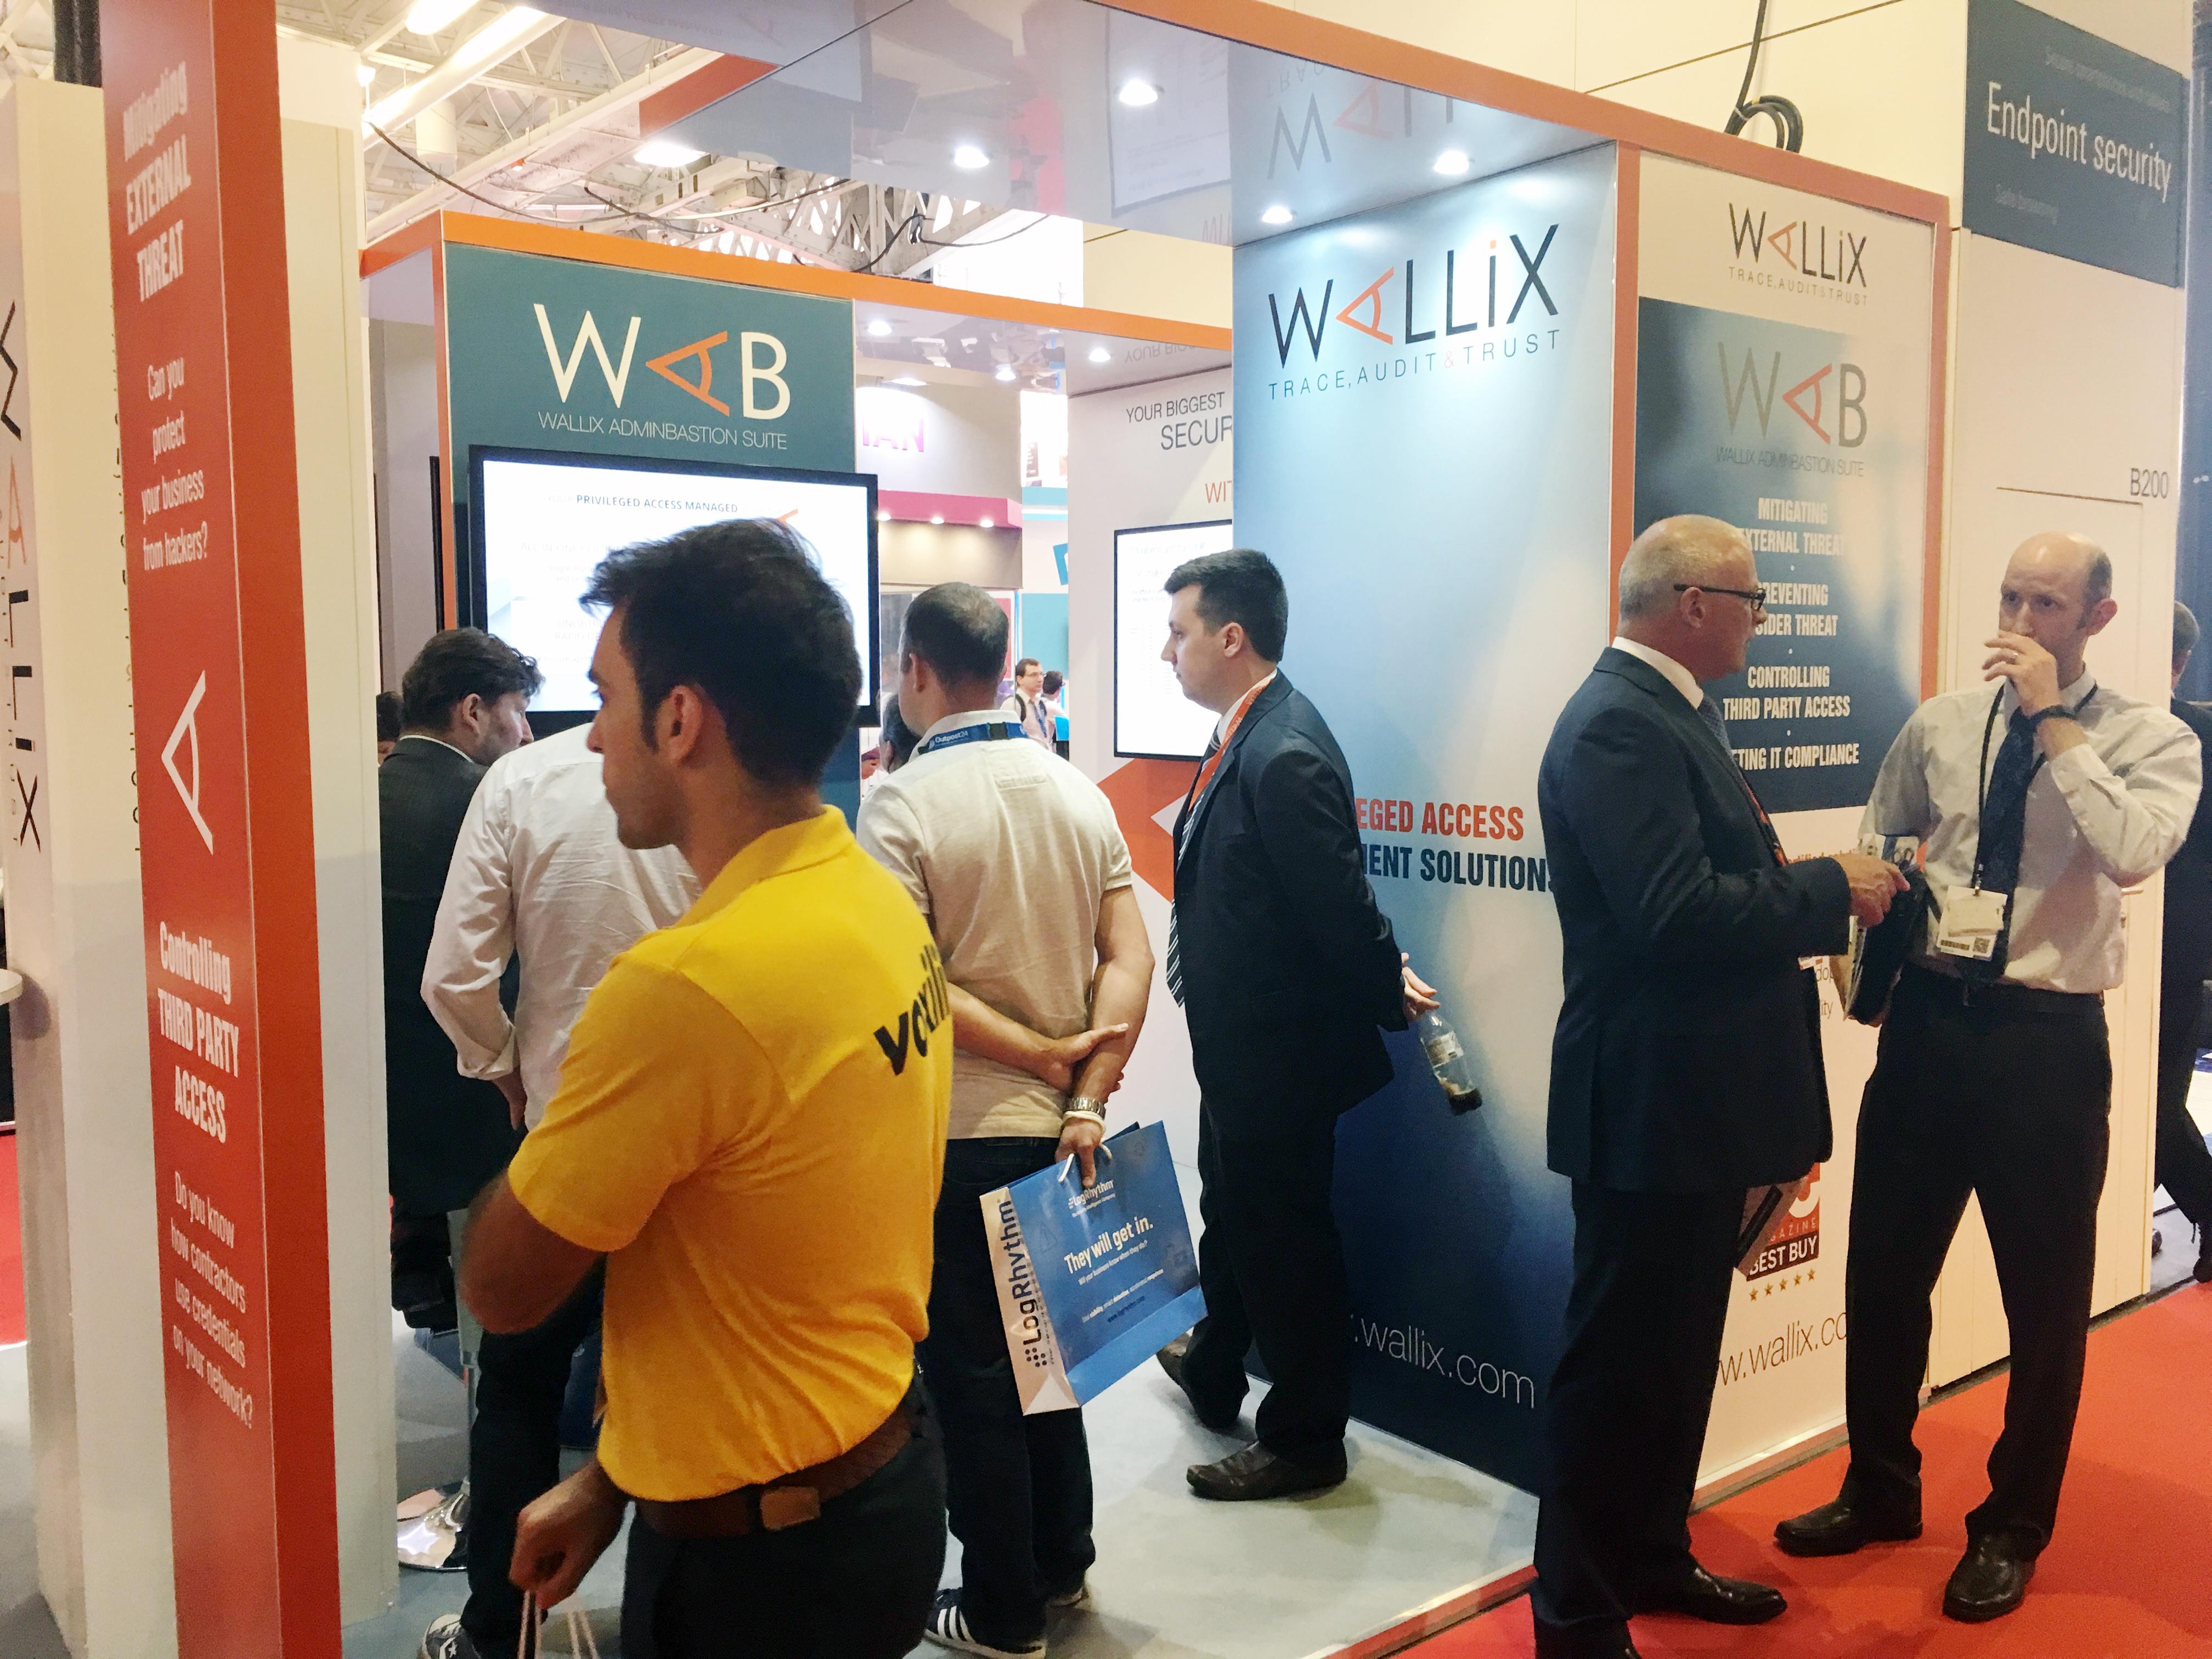 info-security-europe-privileged-access-user-management-wallix-wab-suite.jpg